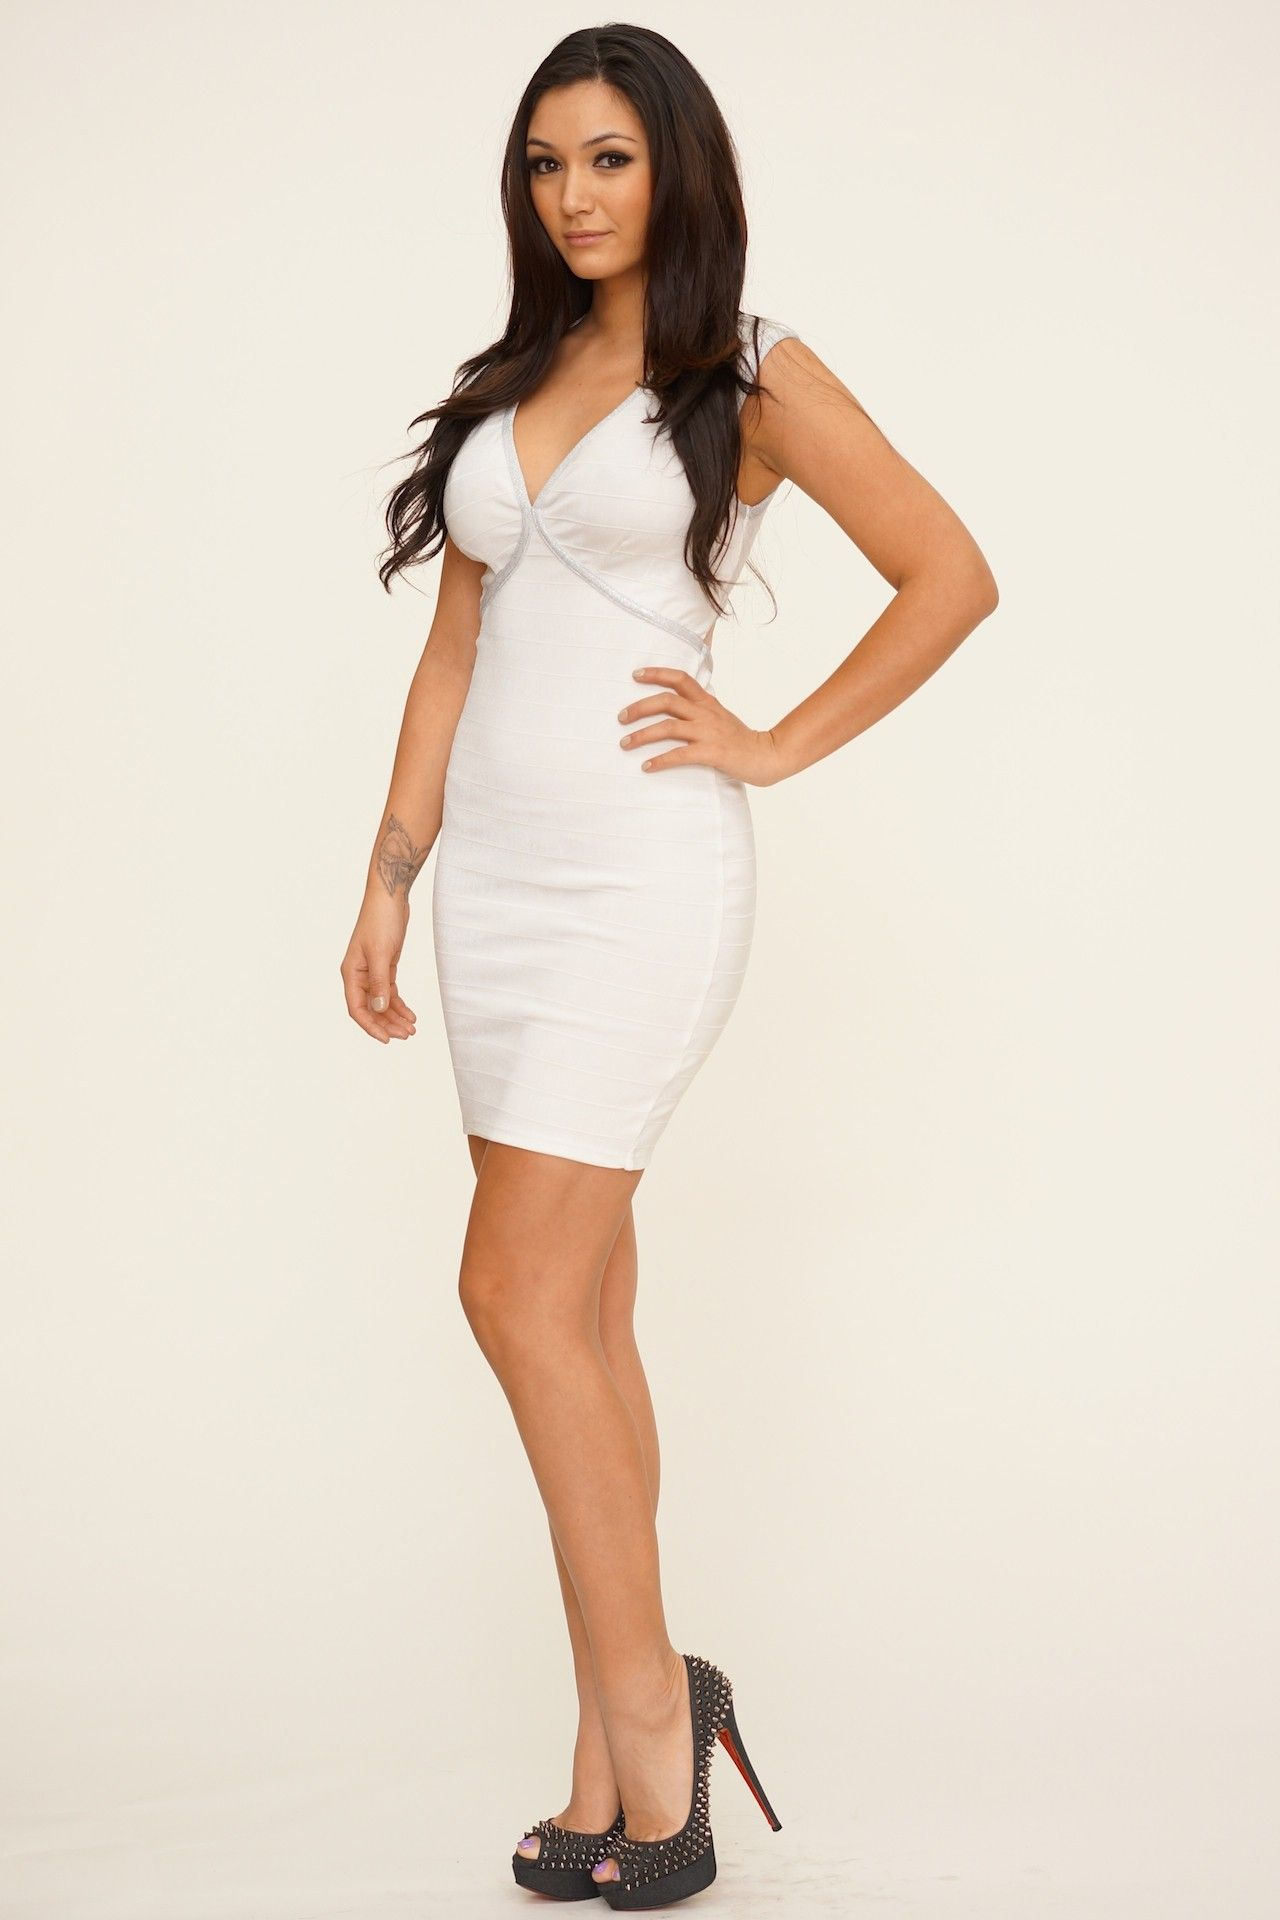 a71f002686e8e dresses_645 | misa campo | White bandage dress, Dresses, White dress